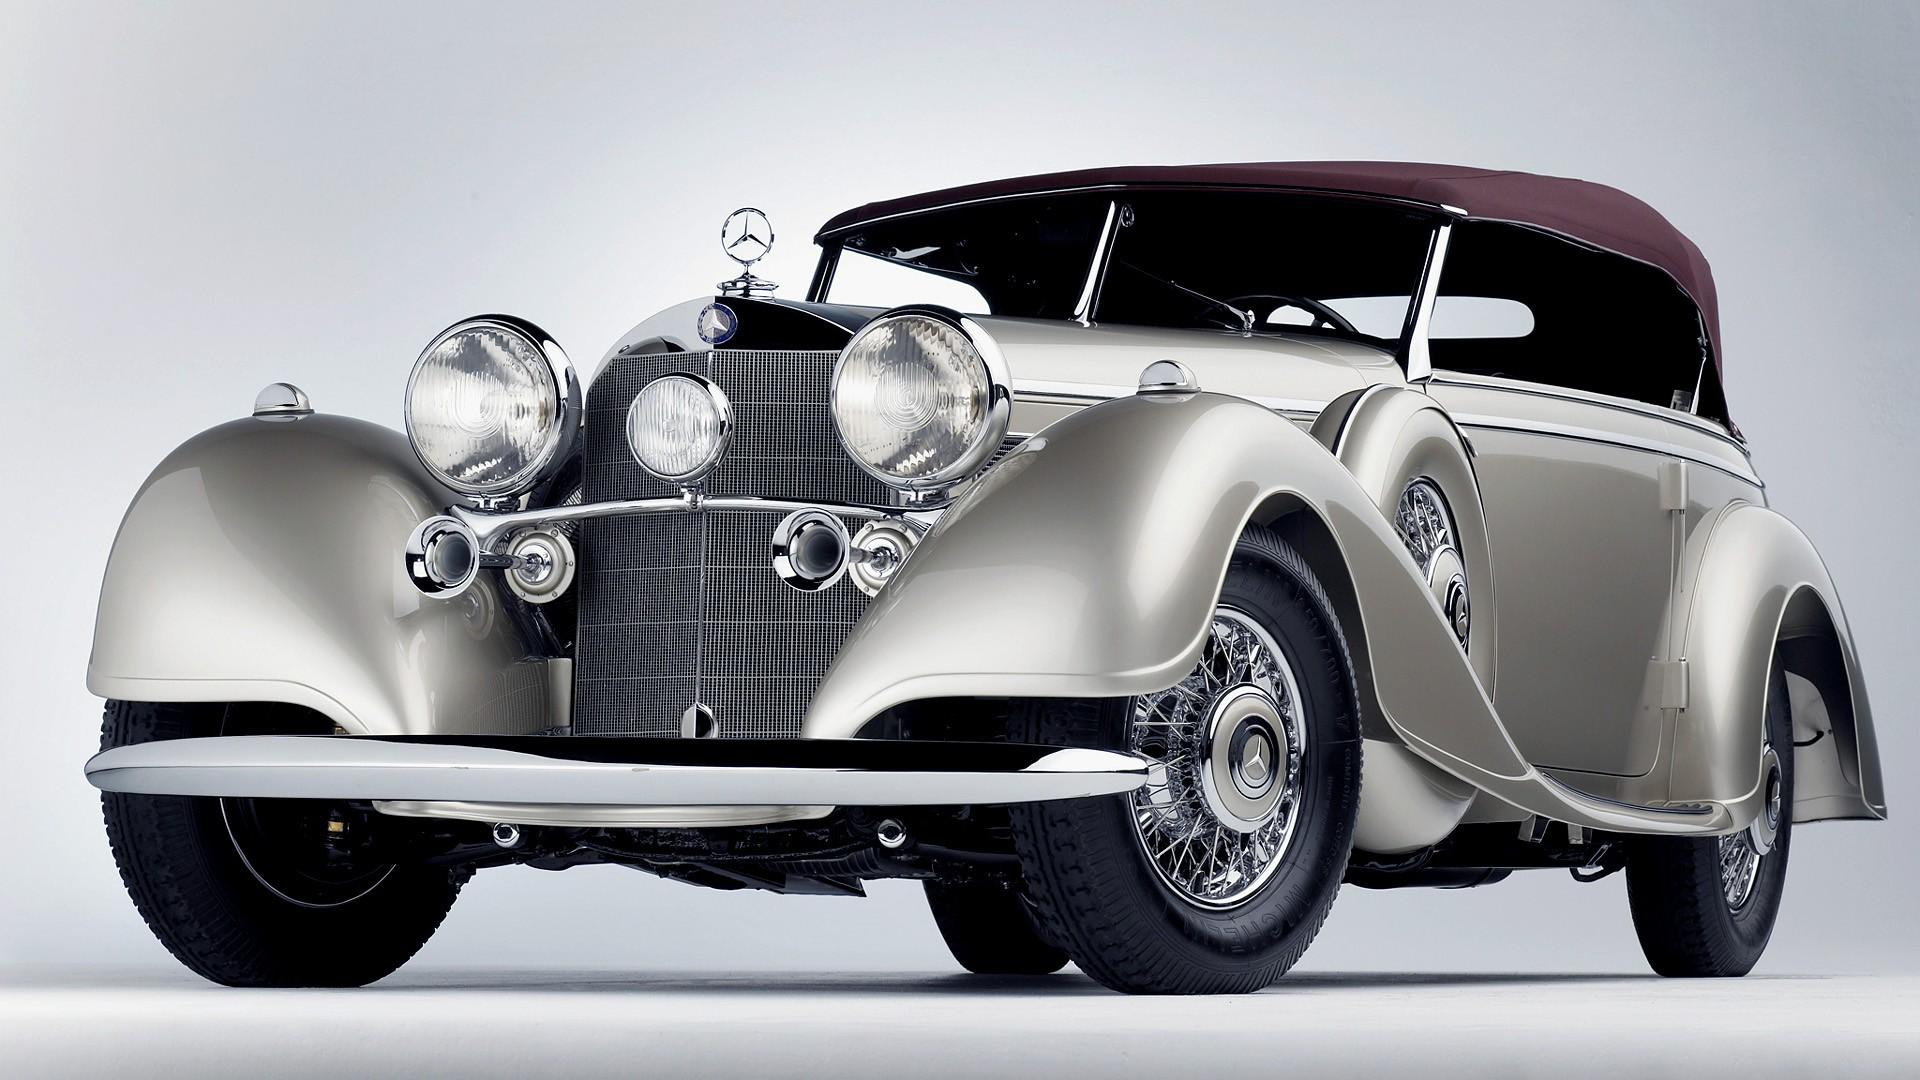 Vintage Cars Classic Cars Mercedes Benz Wallpaper